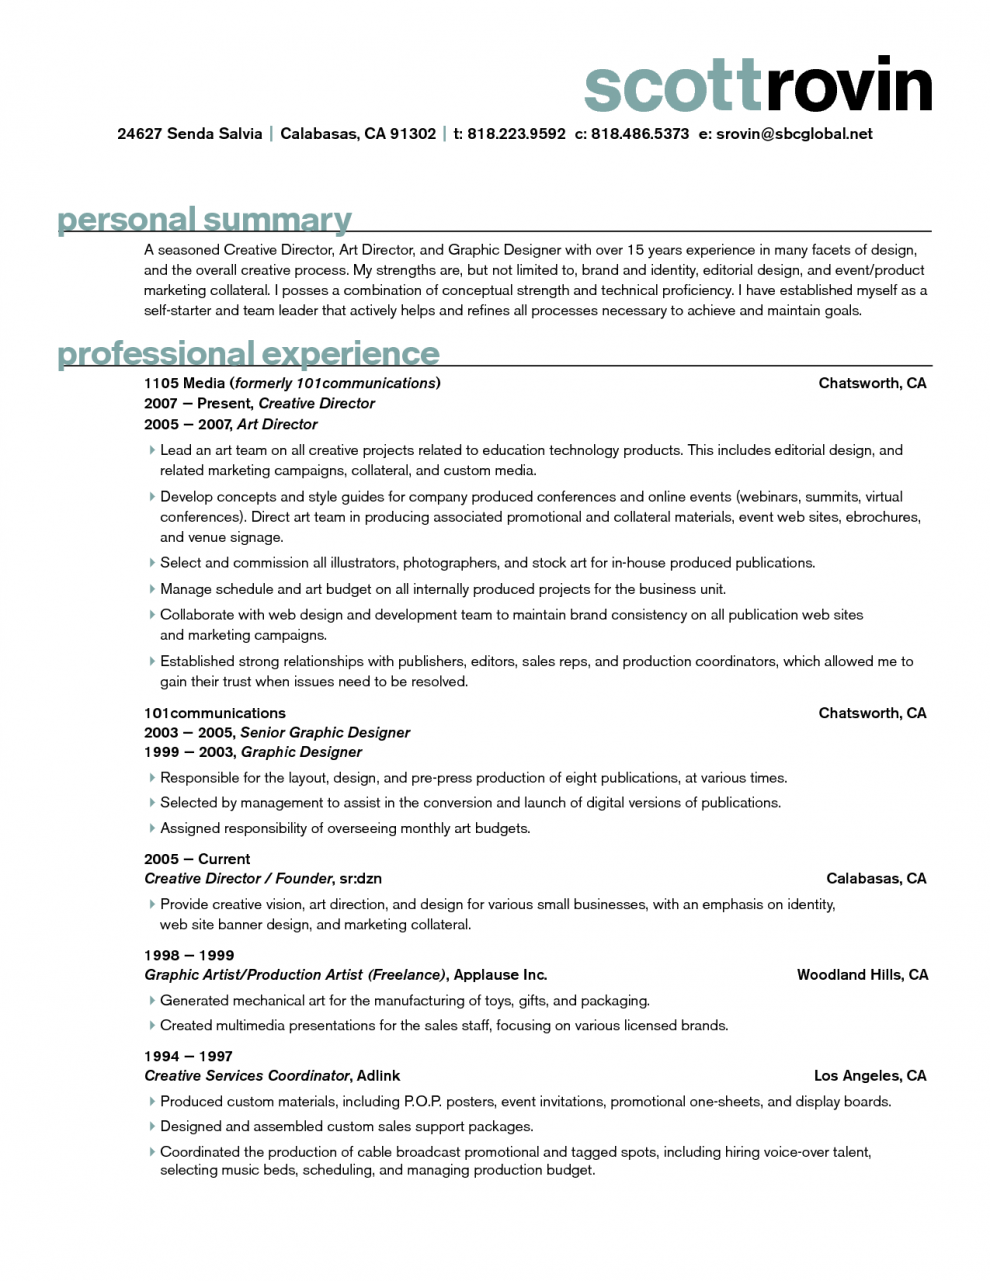 Resume_Template_Job_Description_For_Interior_Designer